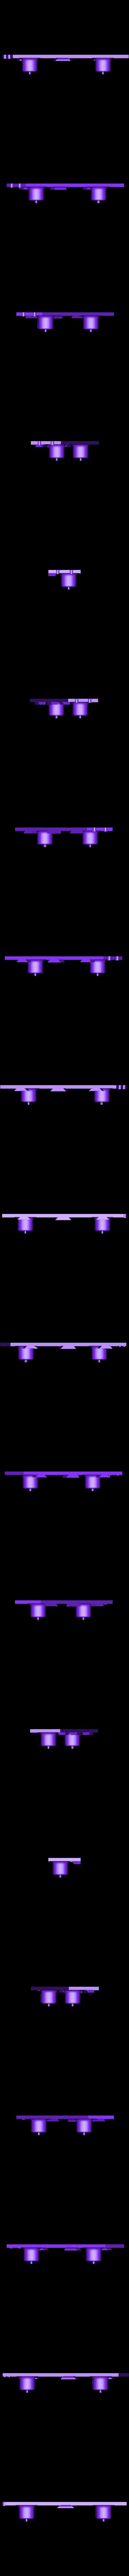 Left.stl Download free STL file Drive bay adapter - screwless! • 3D printing template, 3D-Designs